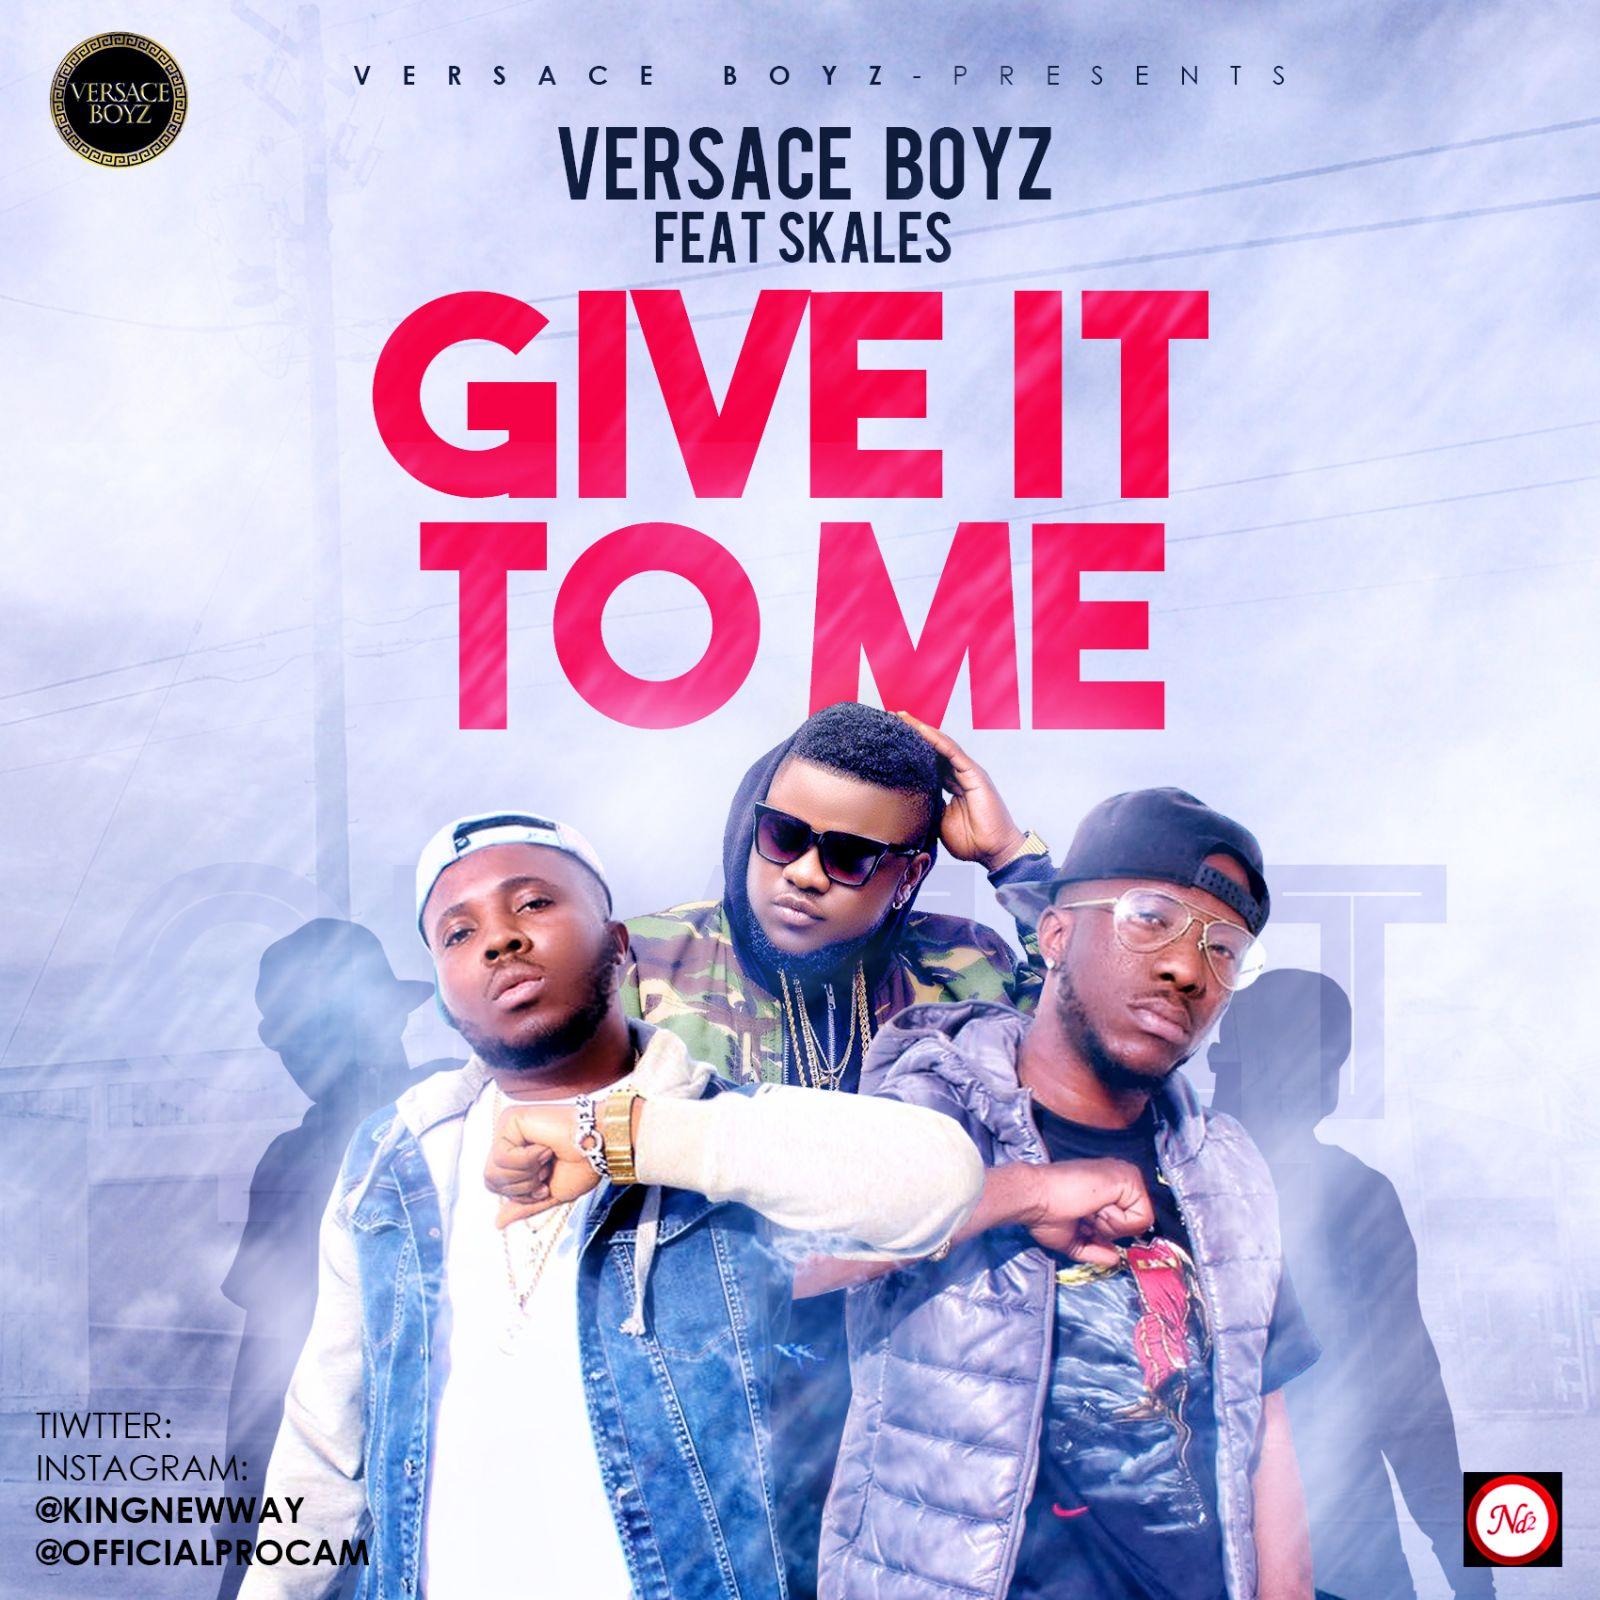 Versace Boyz ft. Skales - Give It To Me (Prod. KillerTunes)